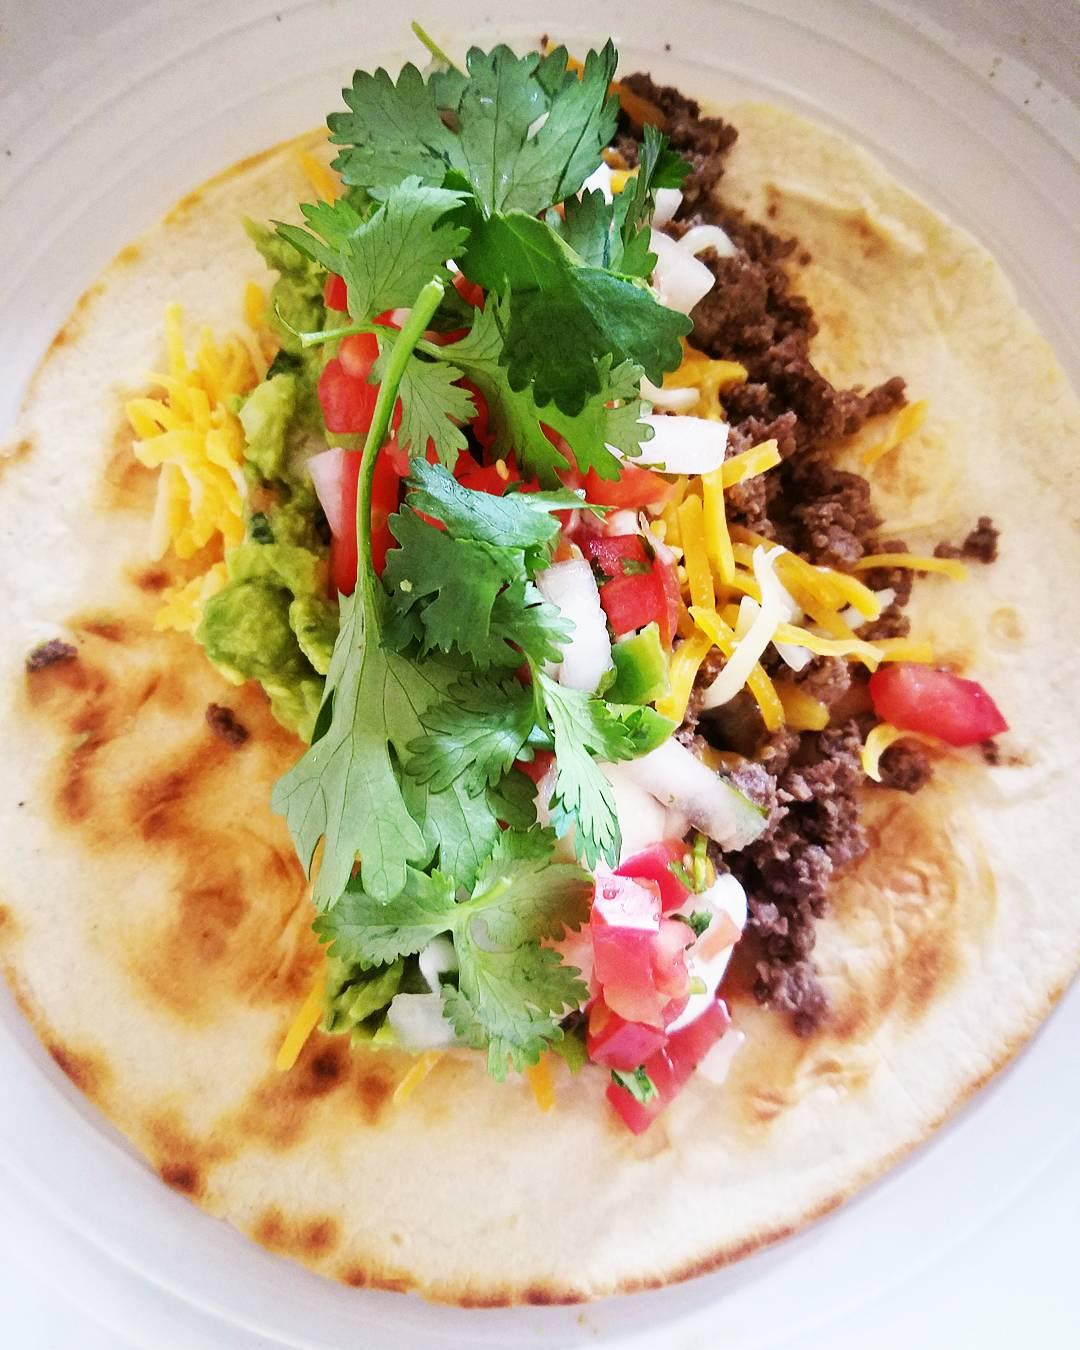 Delicious buffalo meat taco.